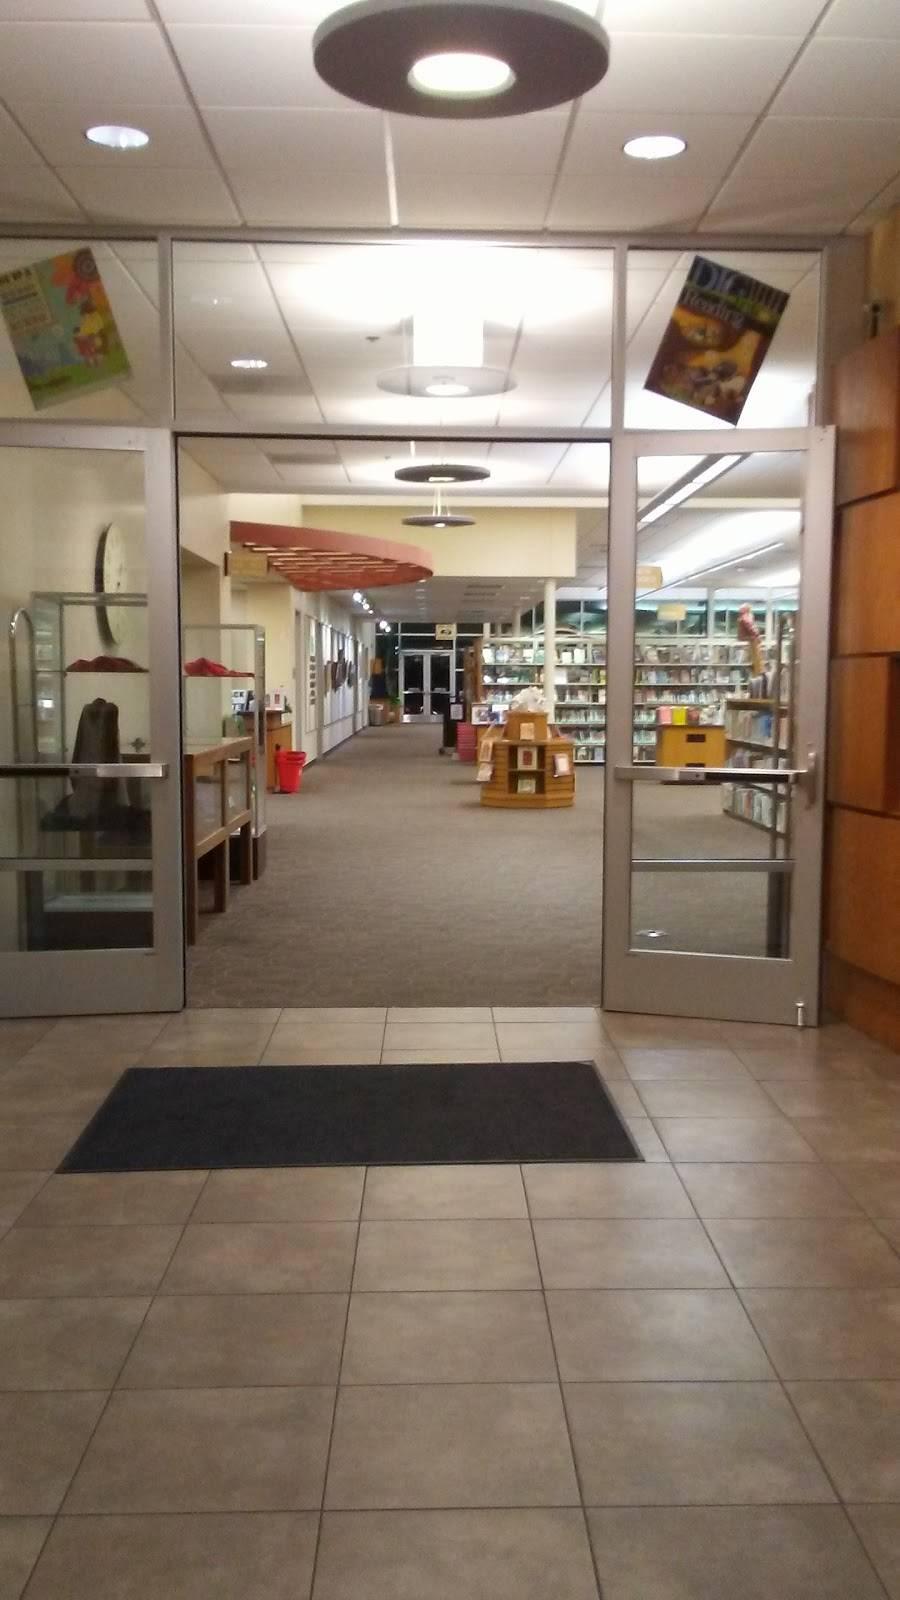 Haltom City Public Library - library  | Photo 3 of 9 | Address: 4809 Haltom Rd, Haltom City, TX 76117, USA | Phone: (817) 222-7786